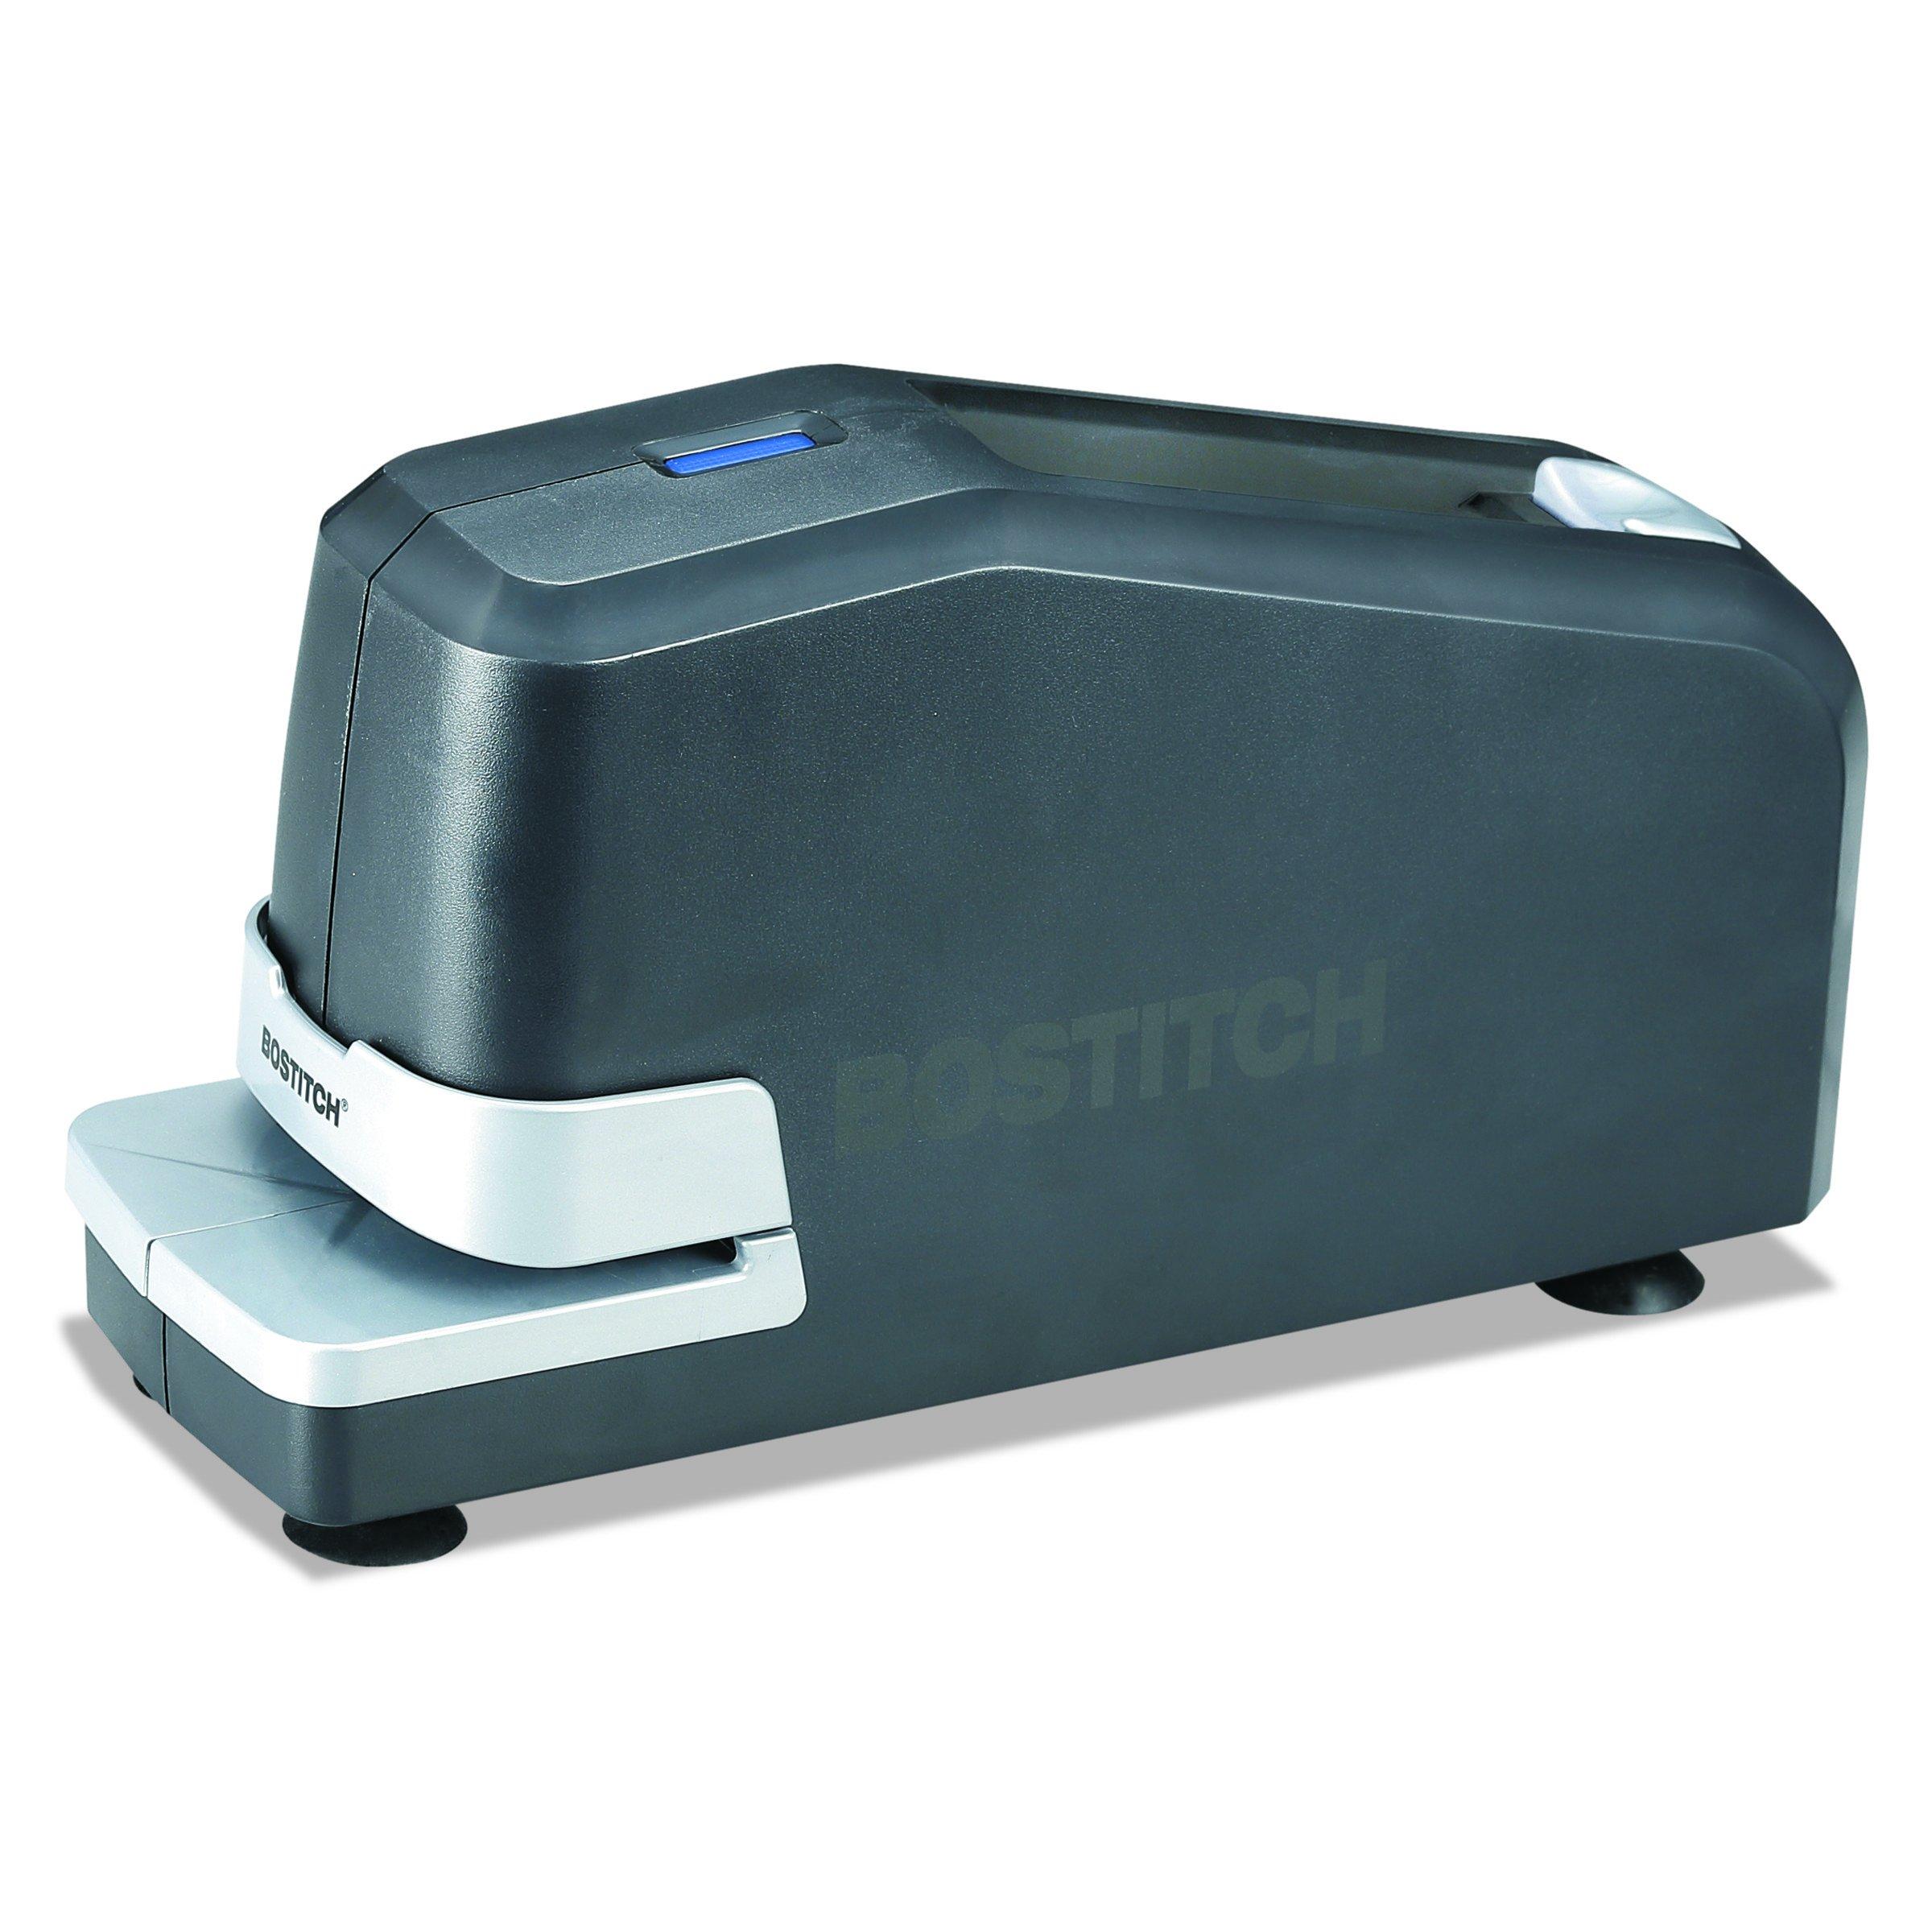 Bostitch Impulse 25 Electric Stapler, 25 Sheet Capacity, Black (02210)